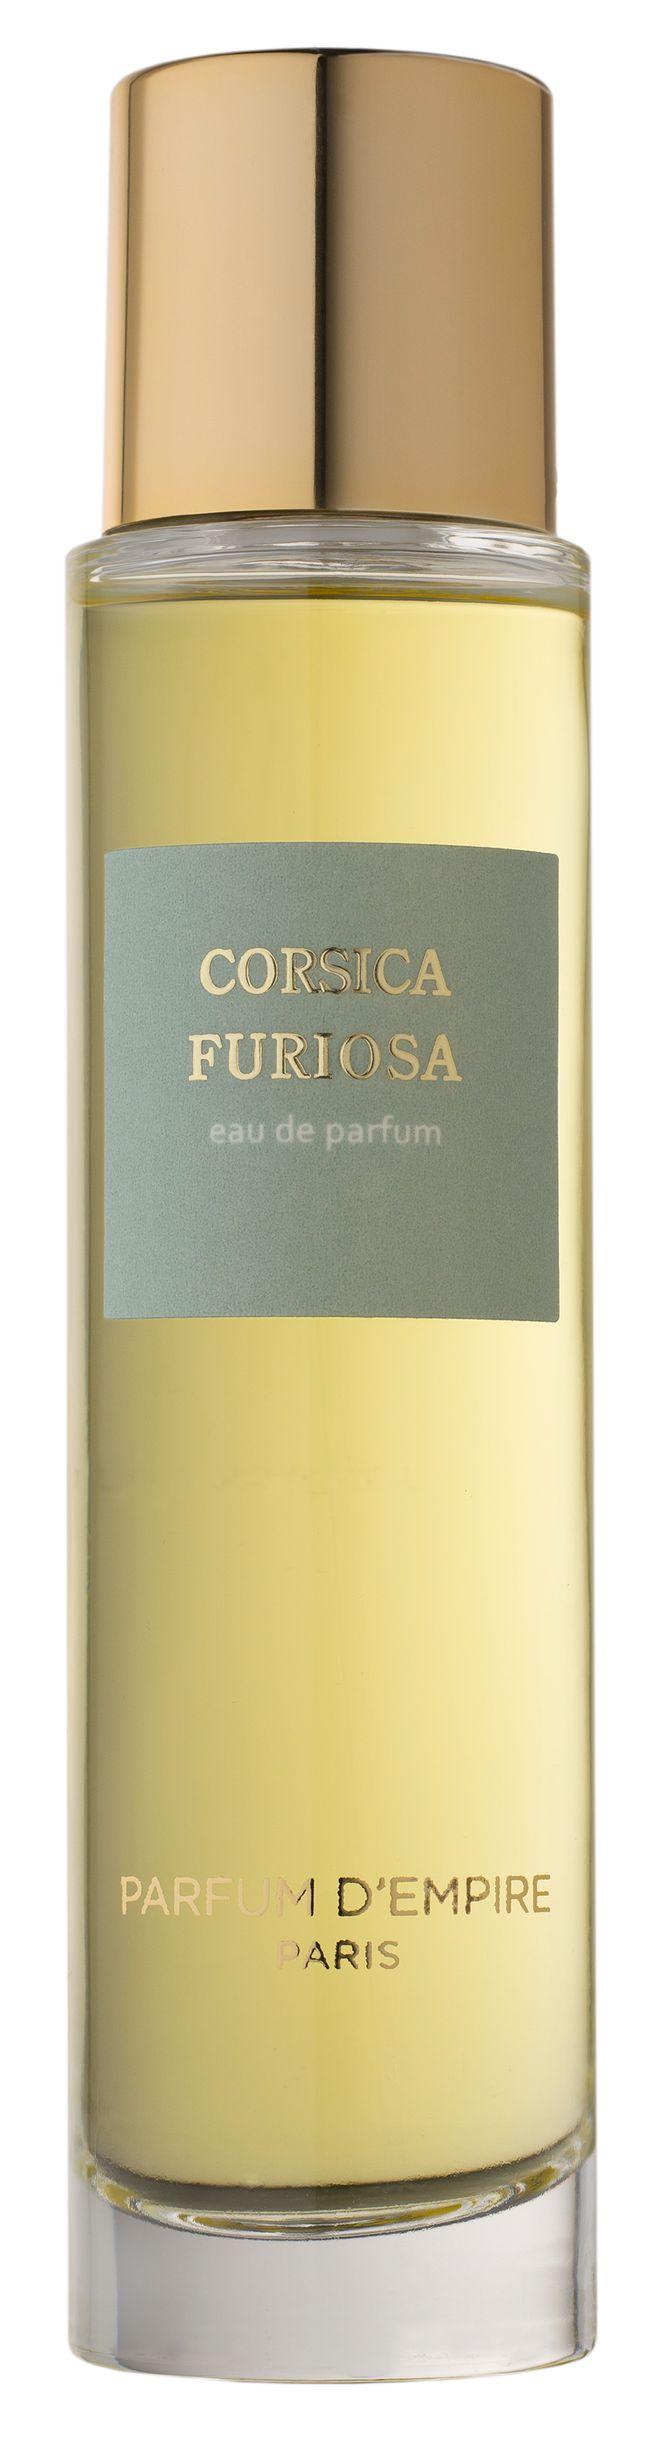 Corsica Furiosa d'Empire